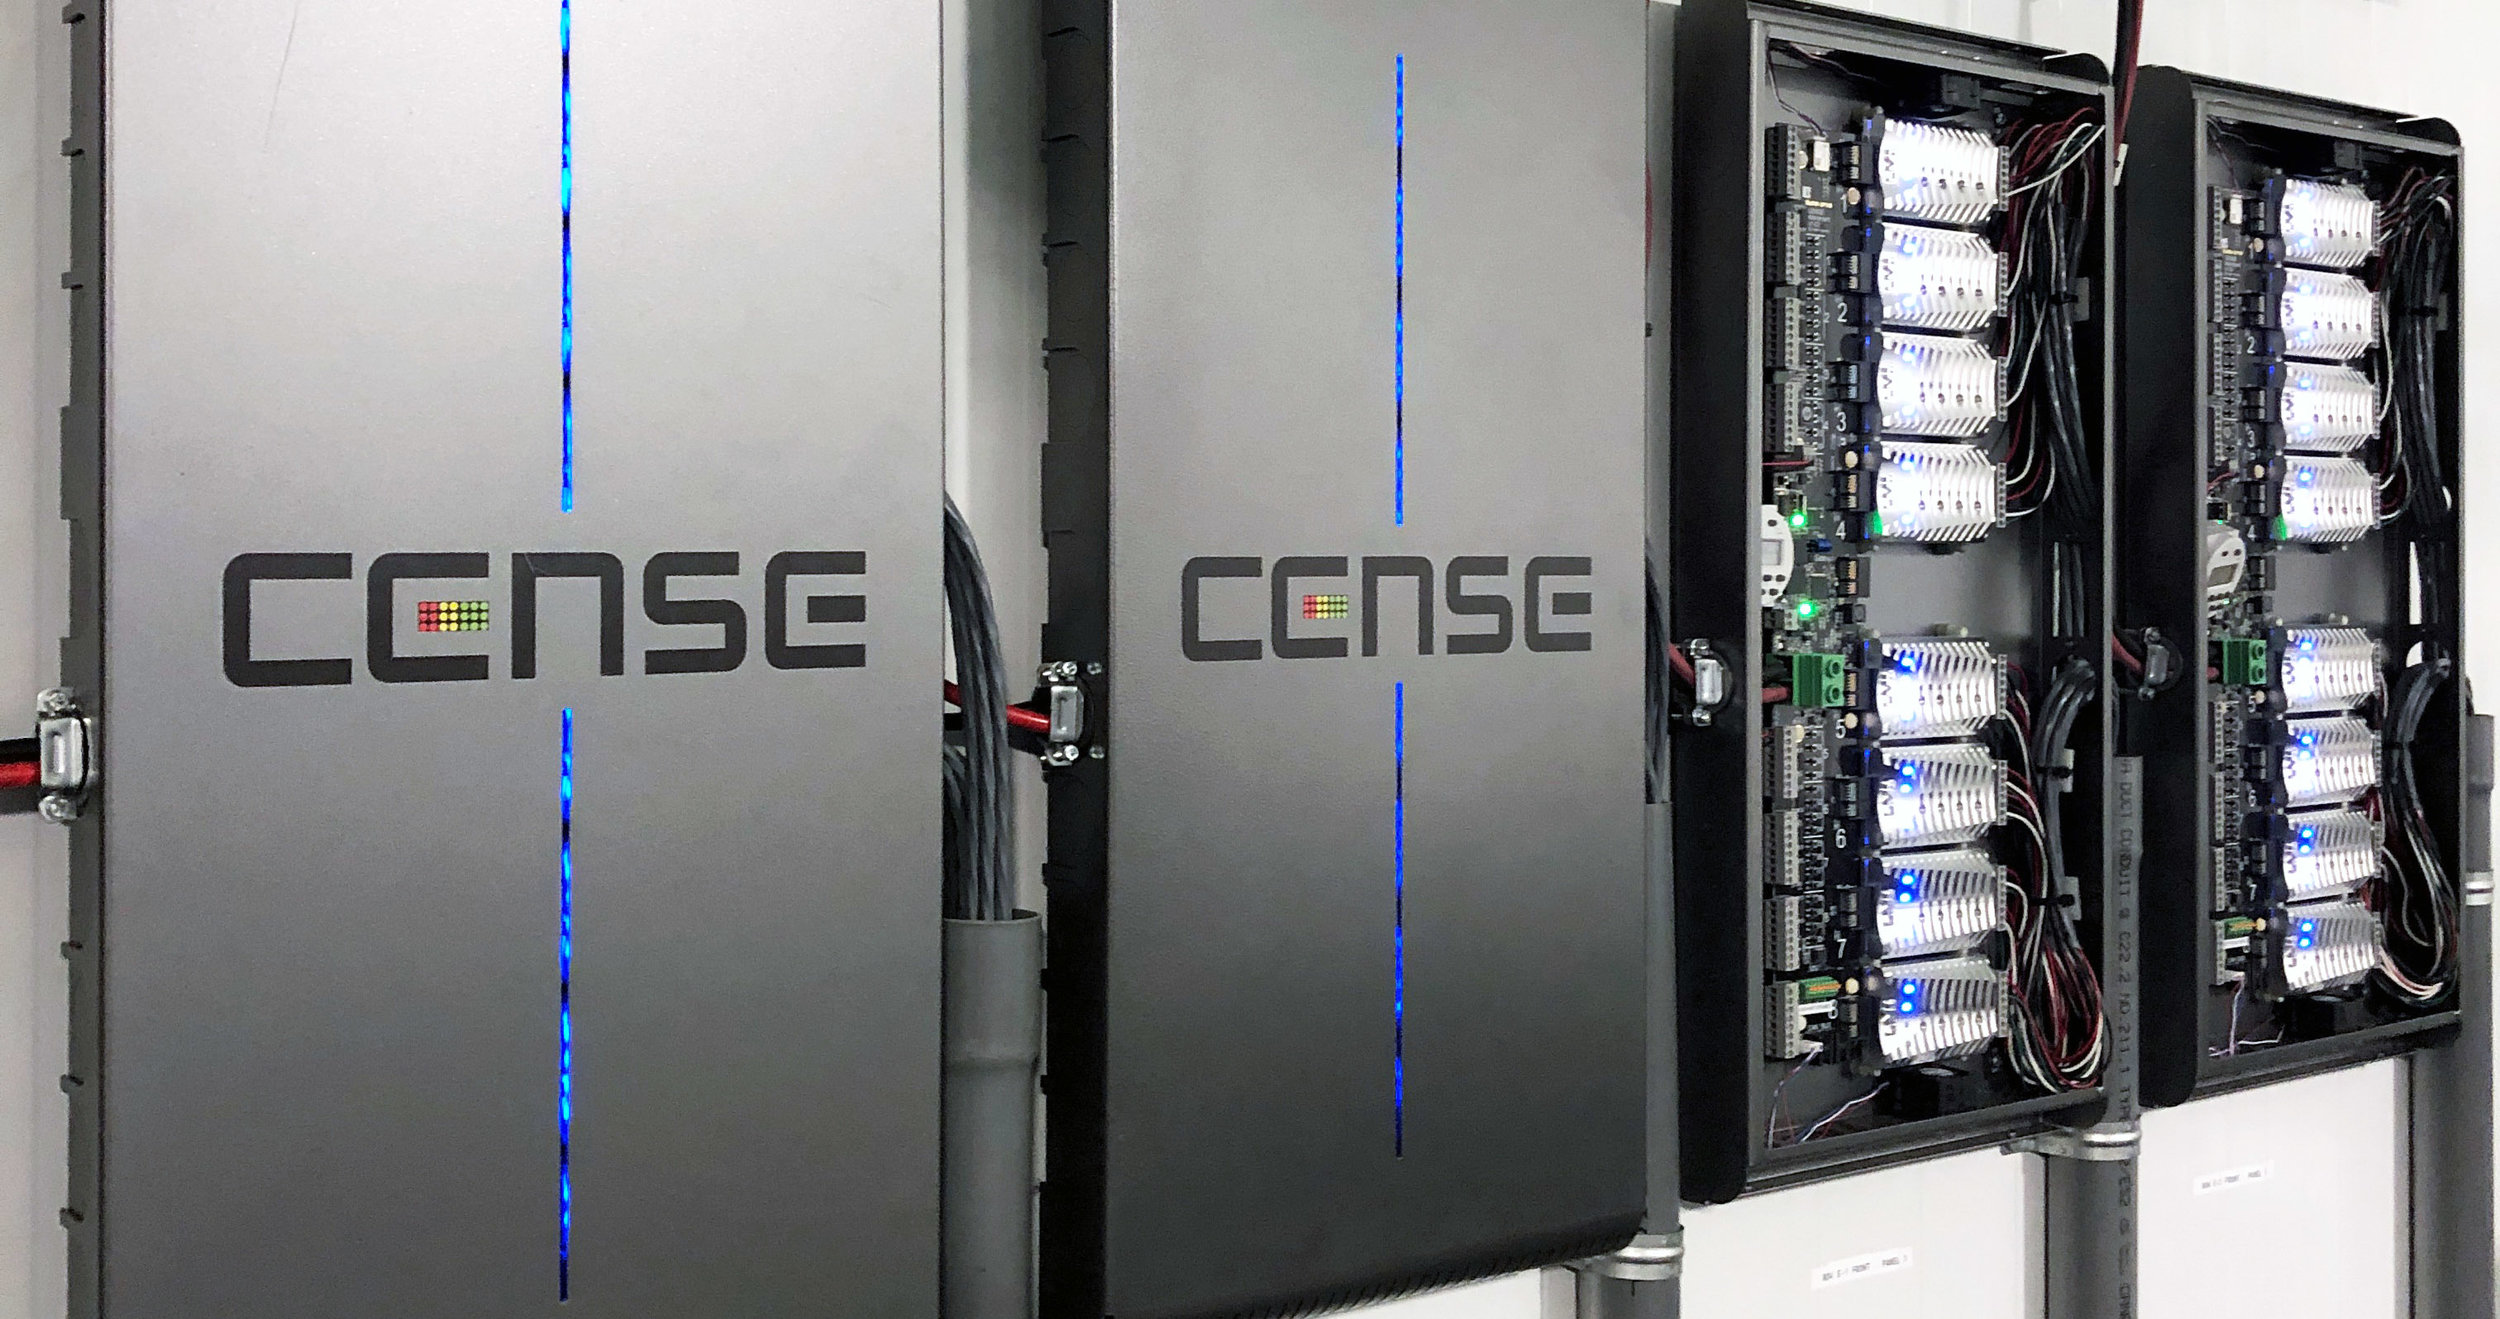 CCense Panels.jpg